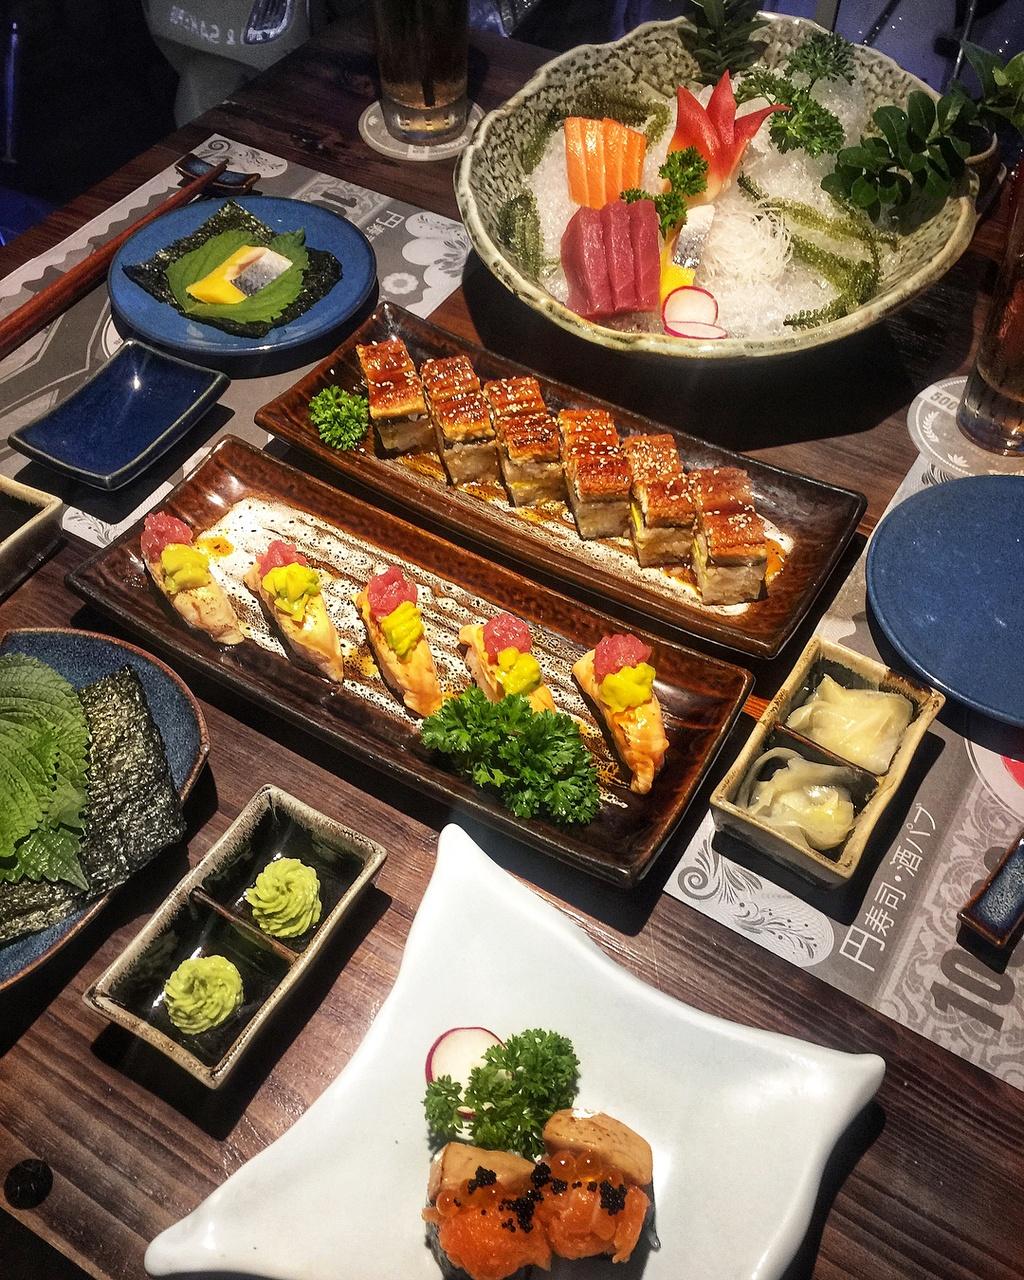 7 quan sushi cac food blogger review ban nen an thu hinh anh 6